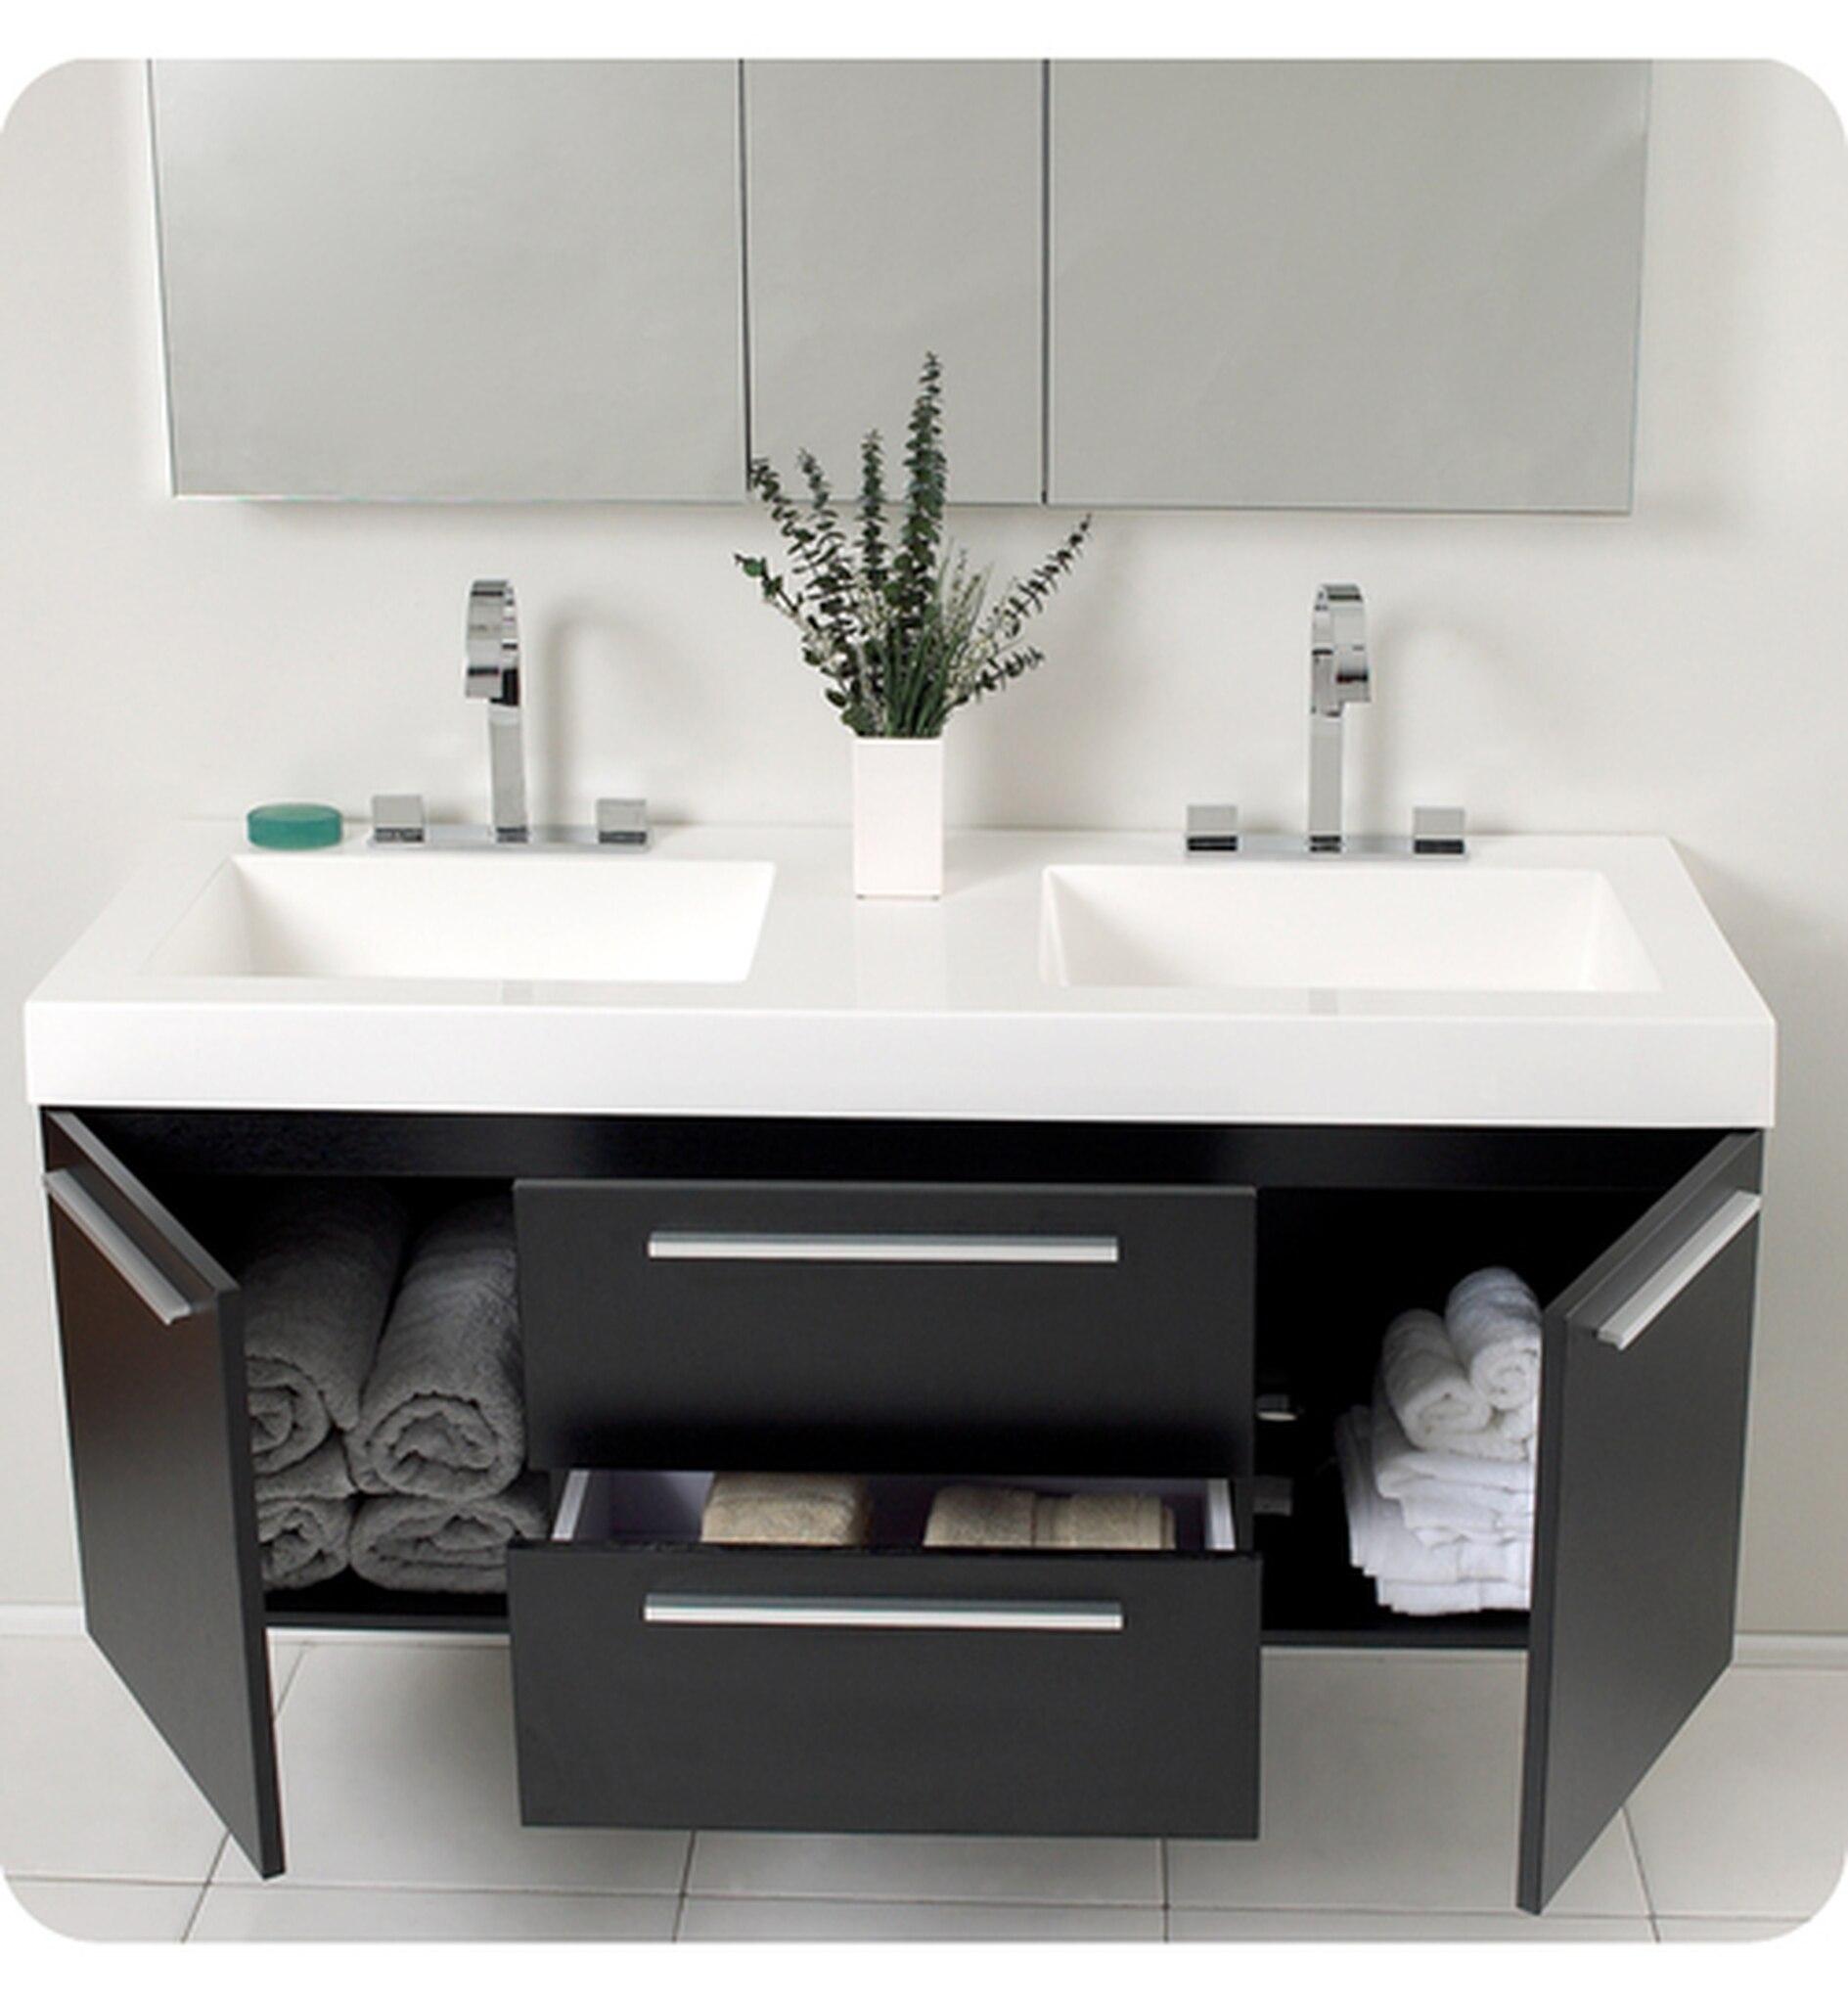 40 Inch Bathroom Vanity You Ll Love In 2021 Visualhunt